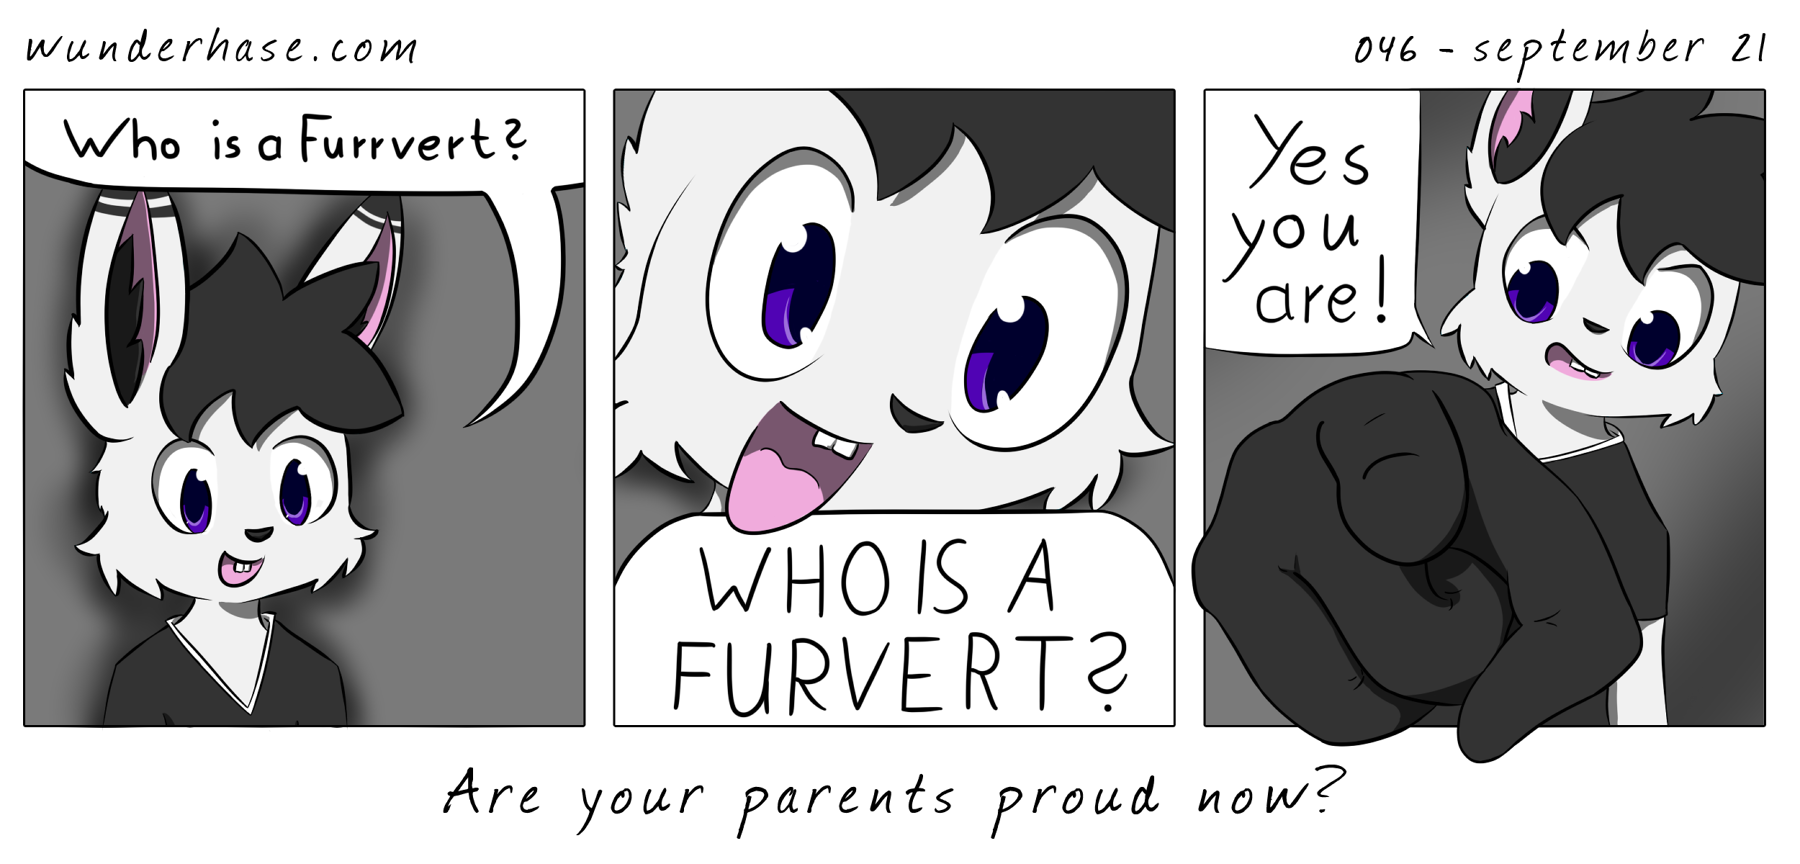 Page 46 – Furvert